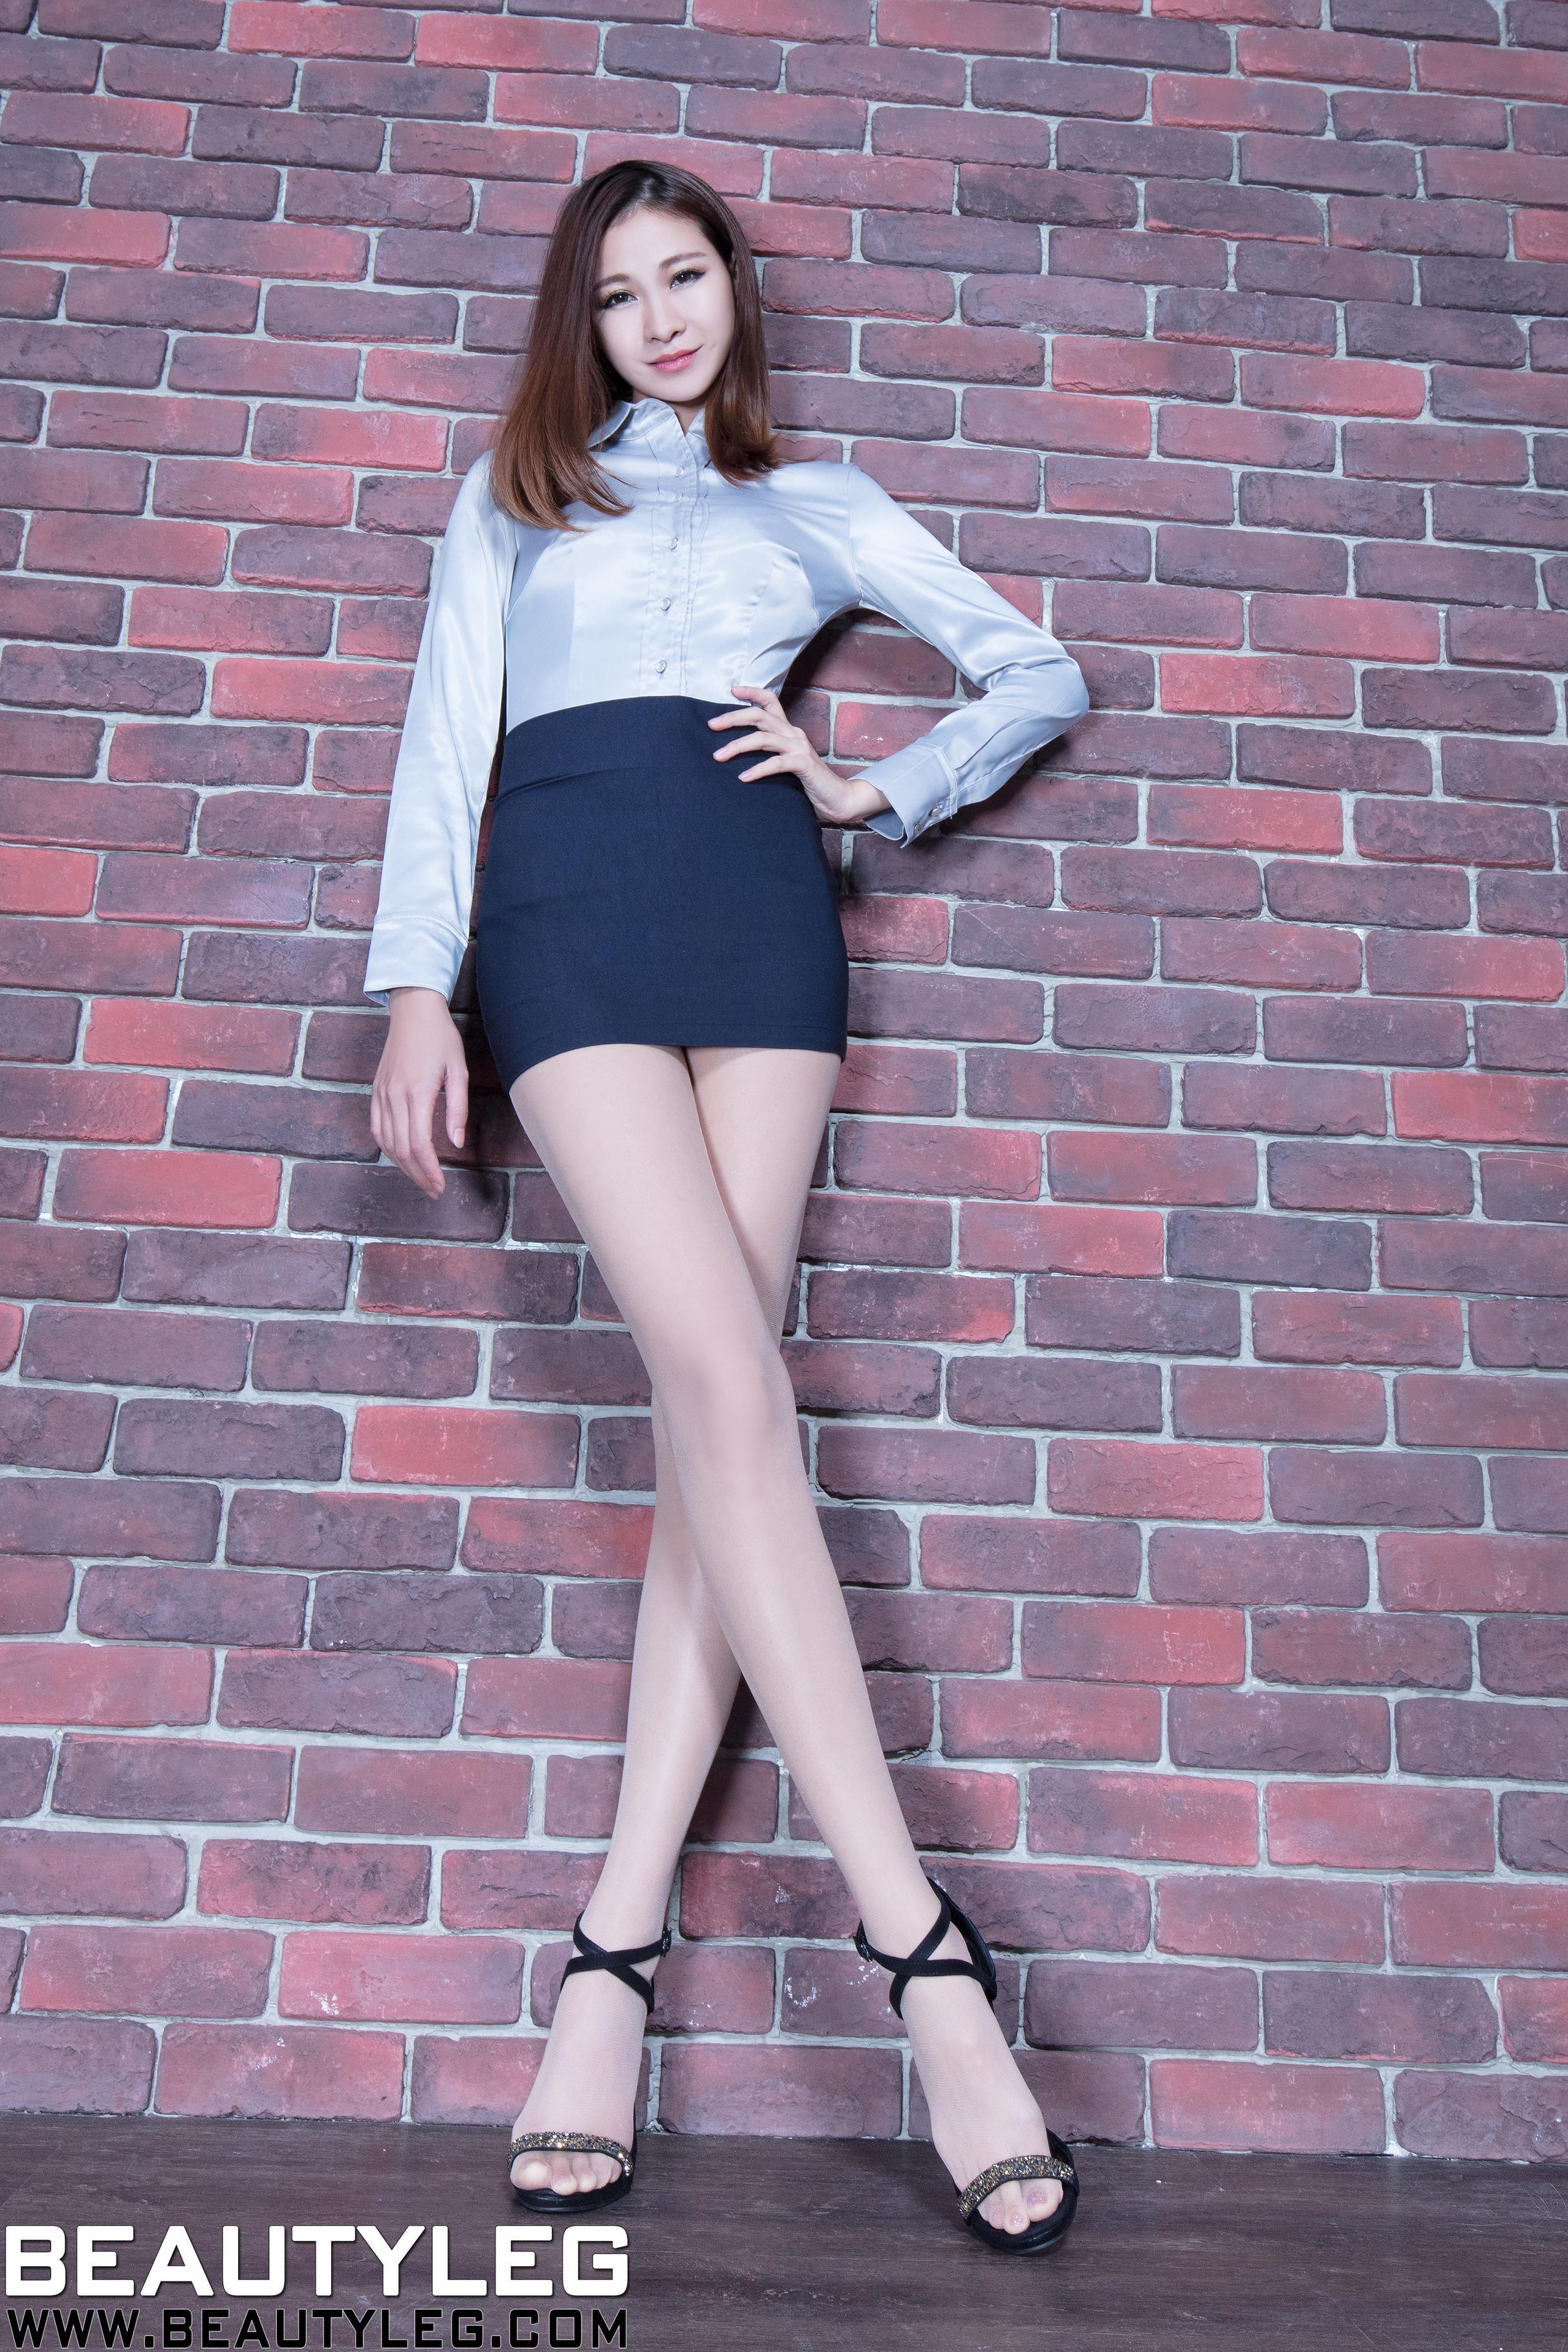 [beautyleg美腿写真]No.1615 性感女秘书 Neko 银色衬衫与黑色包臀短裙加肉色丝袜美腿私房写真集